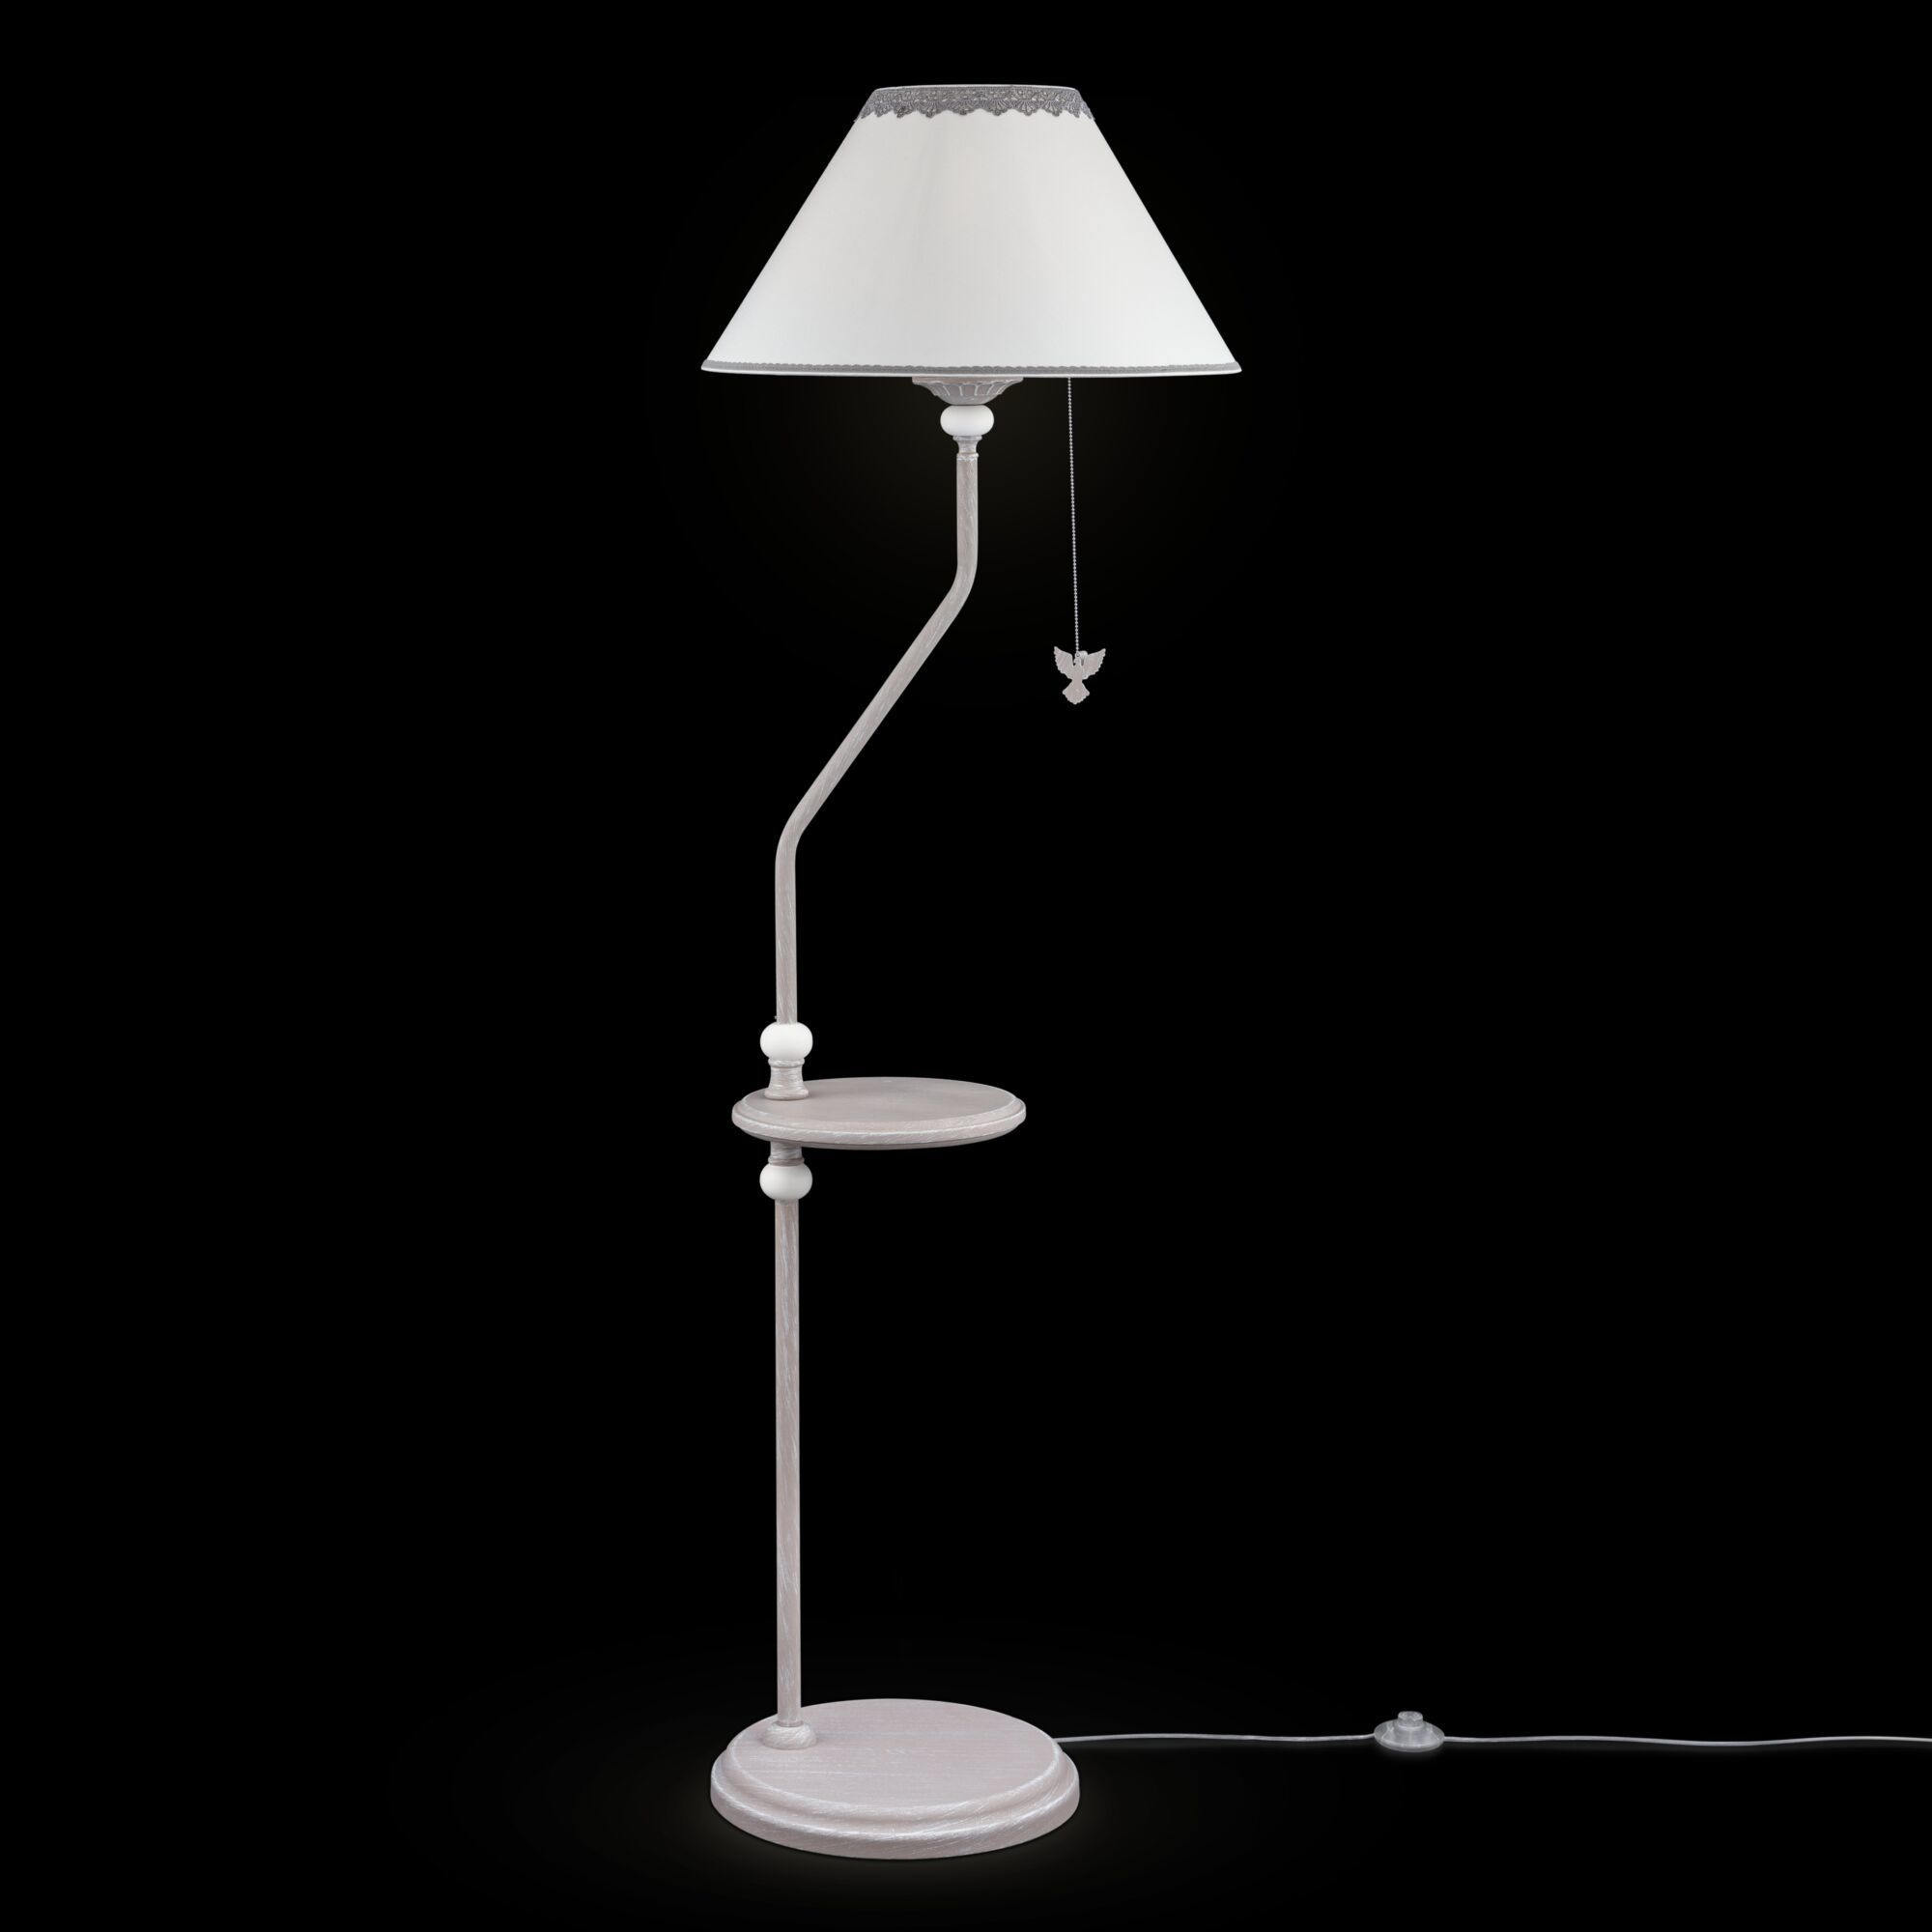 Торшер со столиком Maytoni Classic Elegant Bouquet ARM023-FL-01-S, 1xE27x40W, серый, металл, текстиль - фото 1